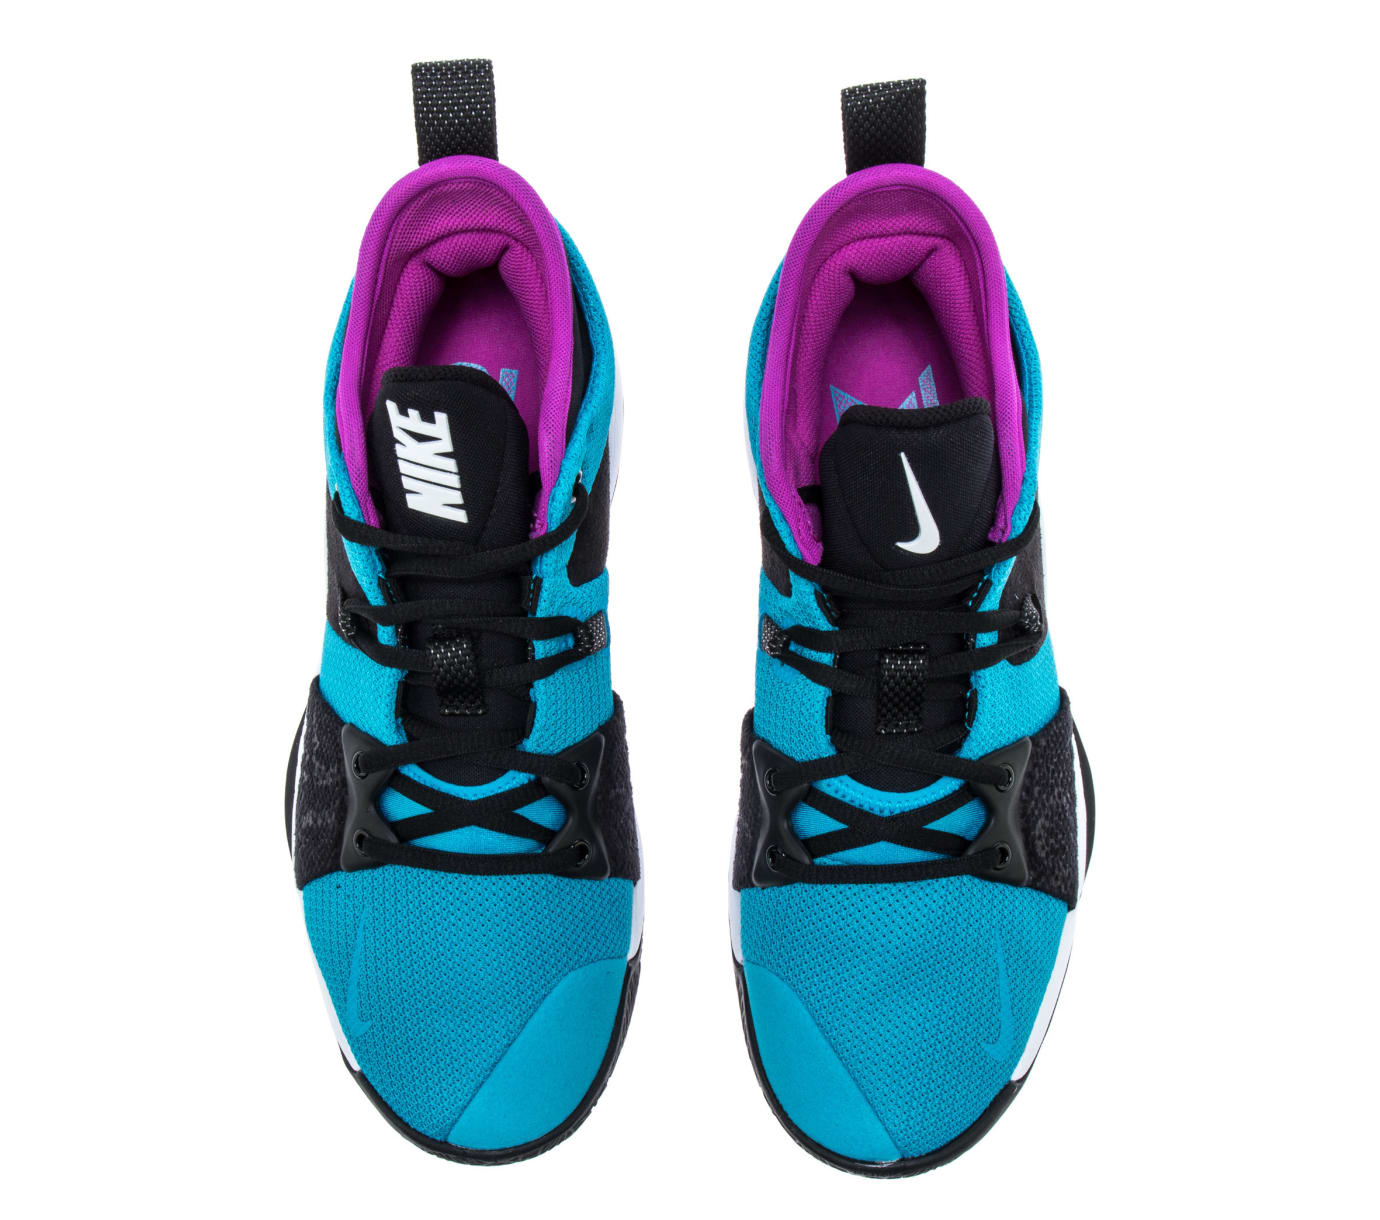 7254bf29891 Image via Shoe Palace Nike PG2  Blue Lagoon Hyper Violet White  AJ2039-402  (Top